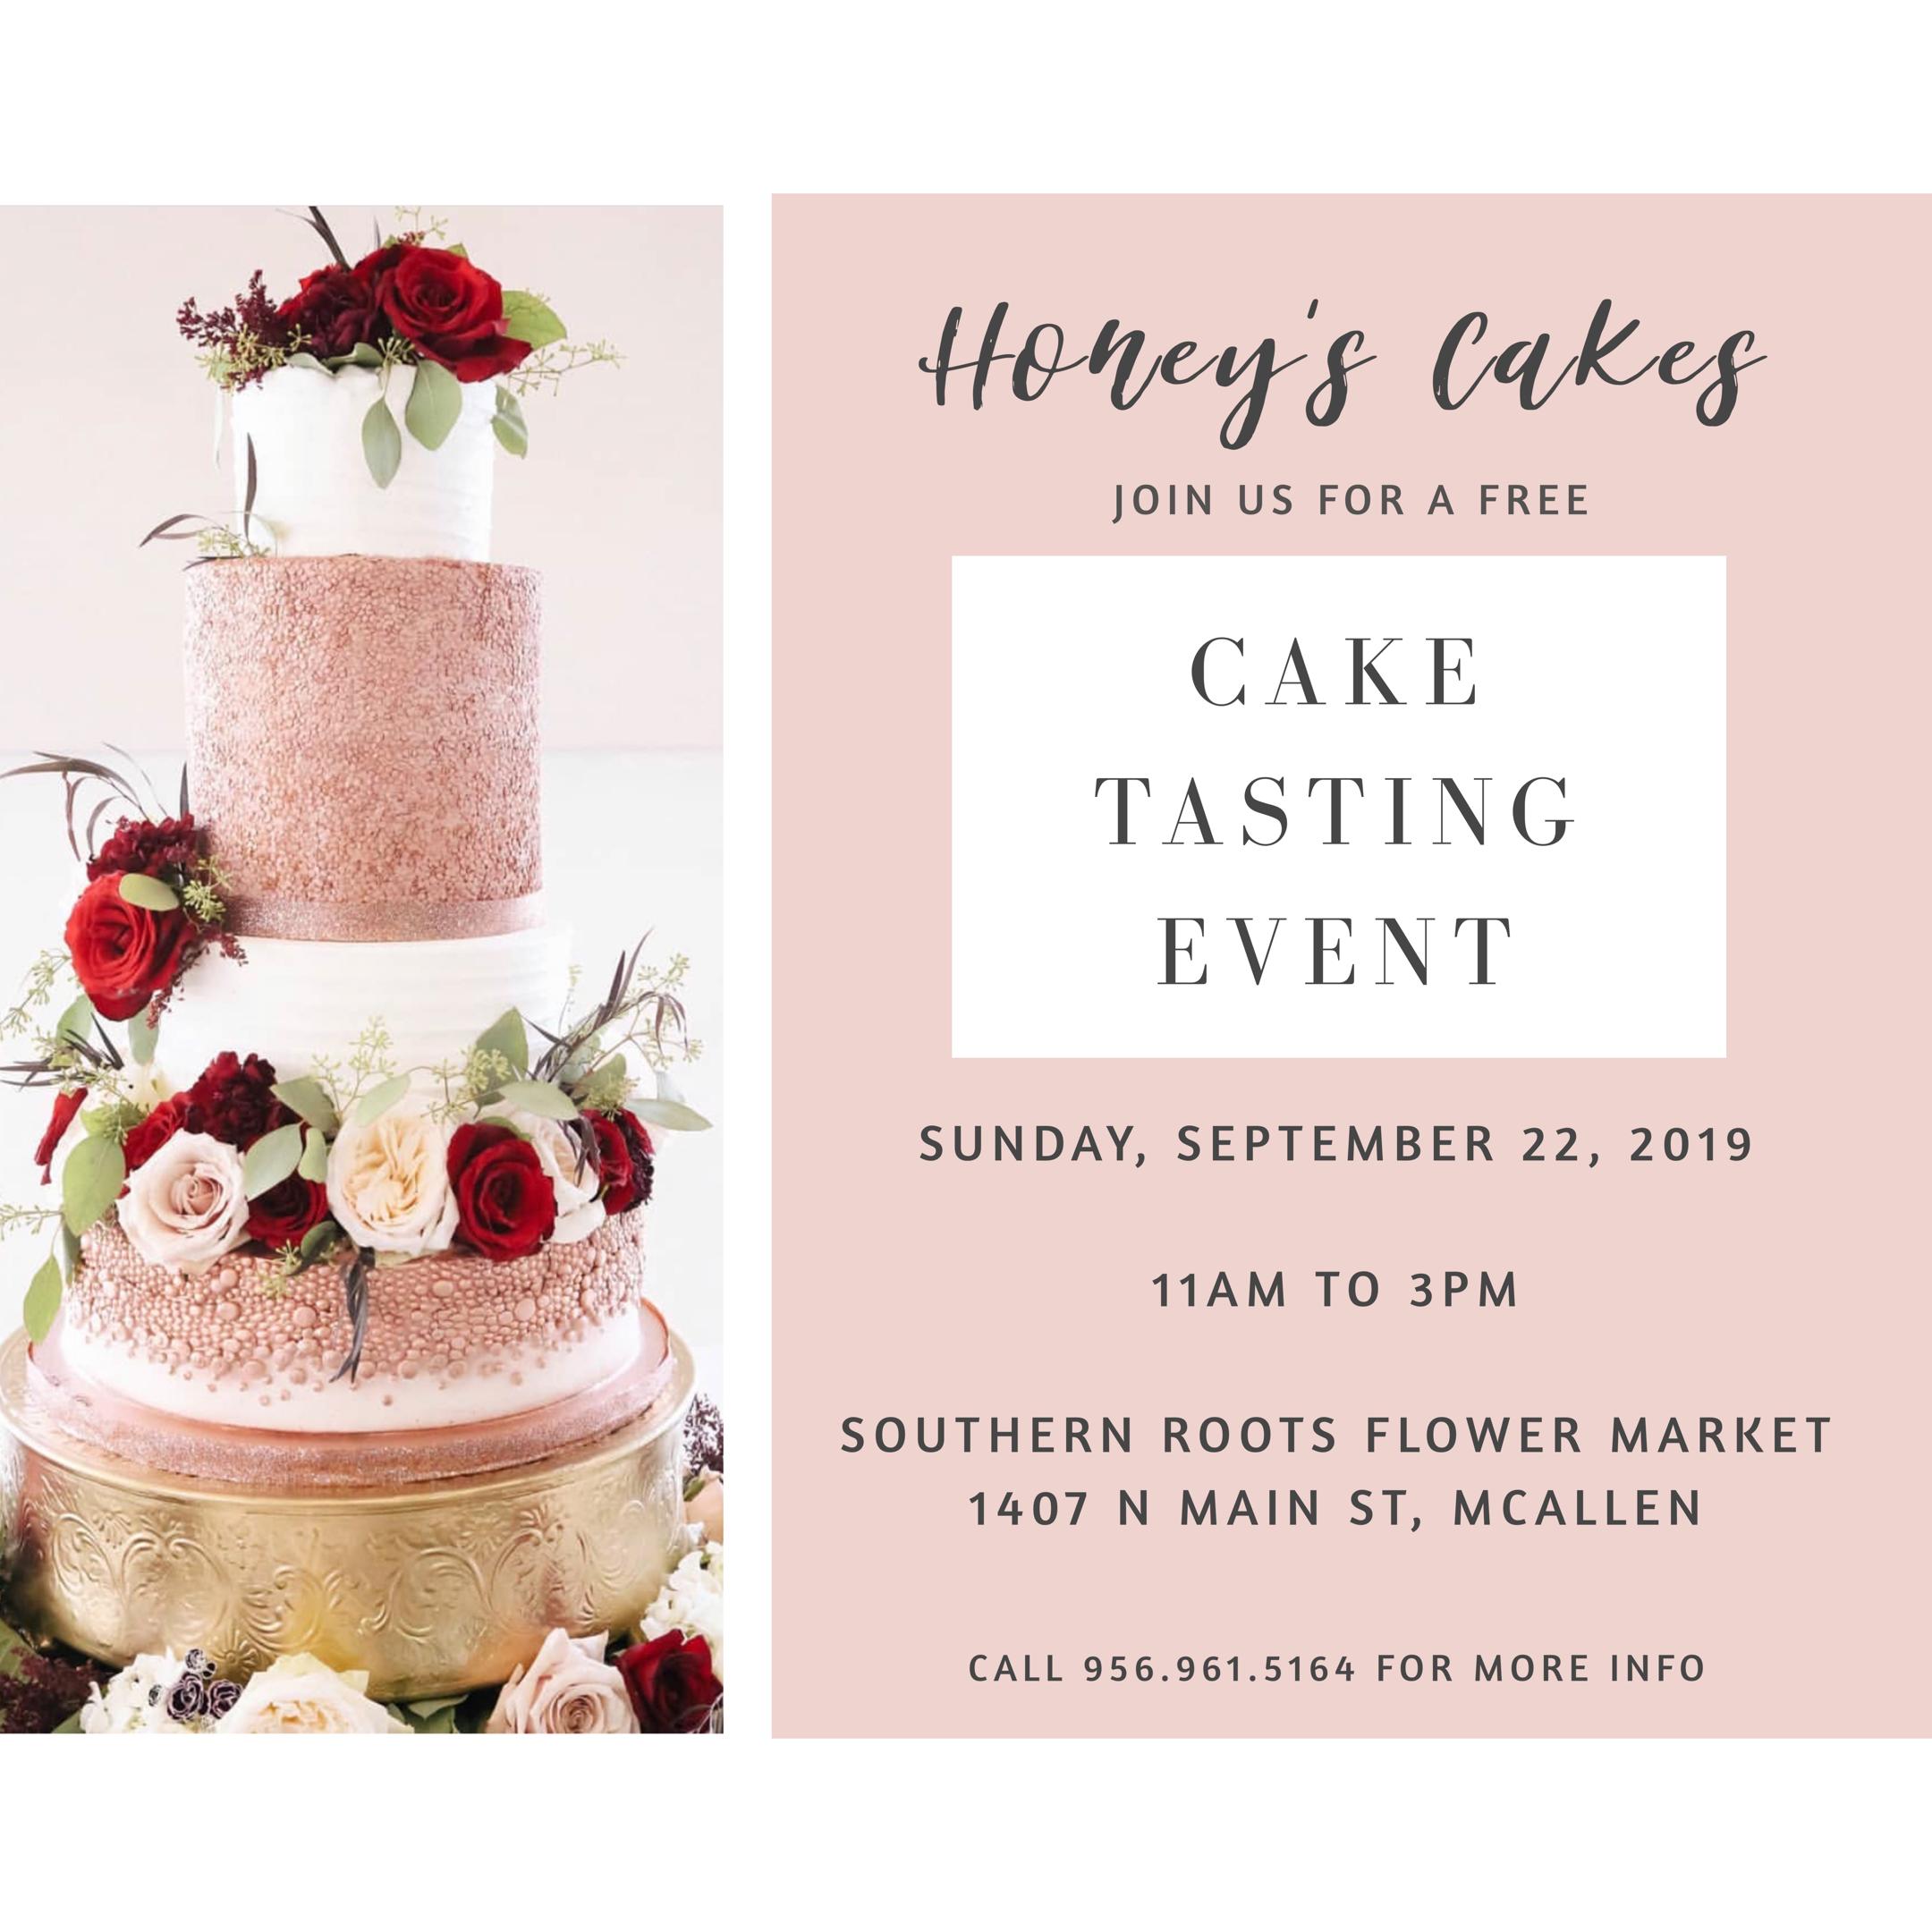 Honey S Cakes Amazing Custom Cakes And Pastry Design